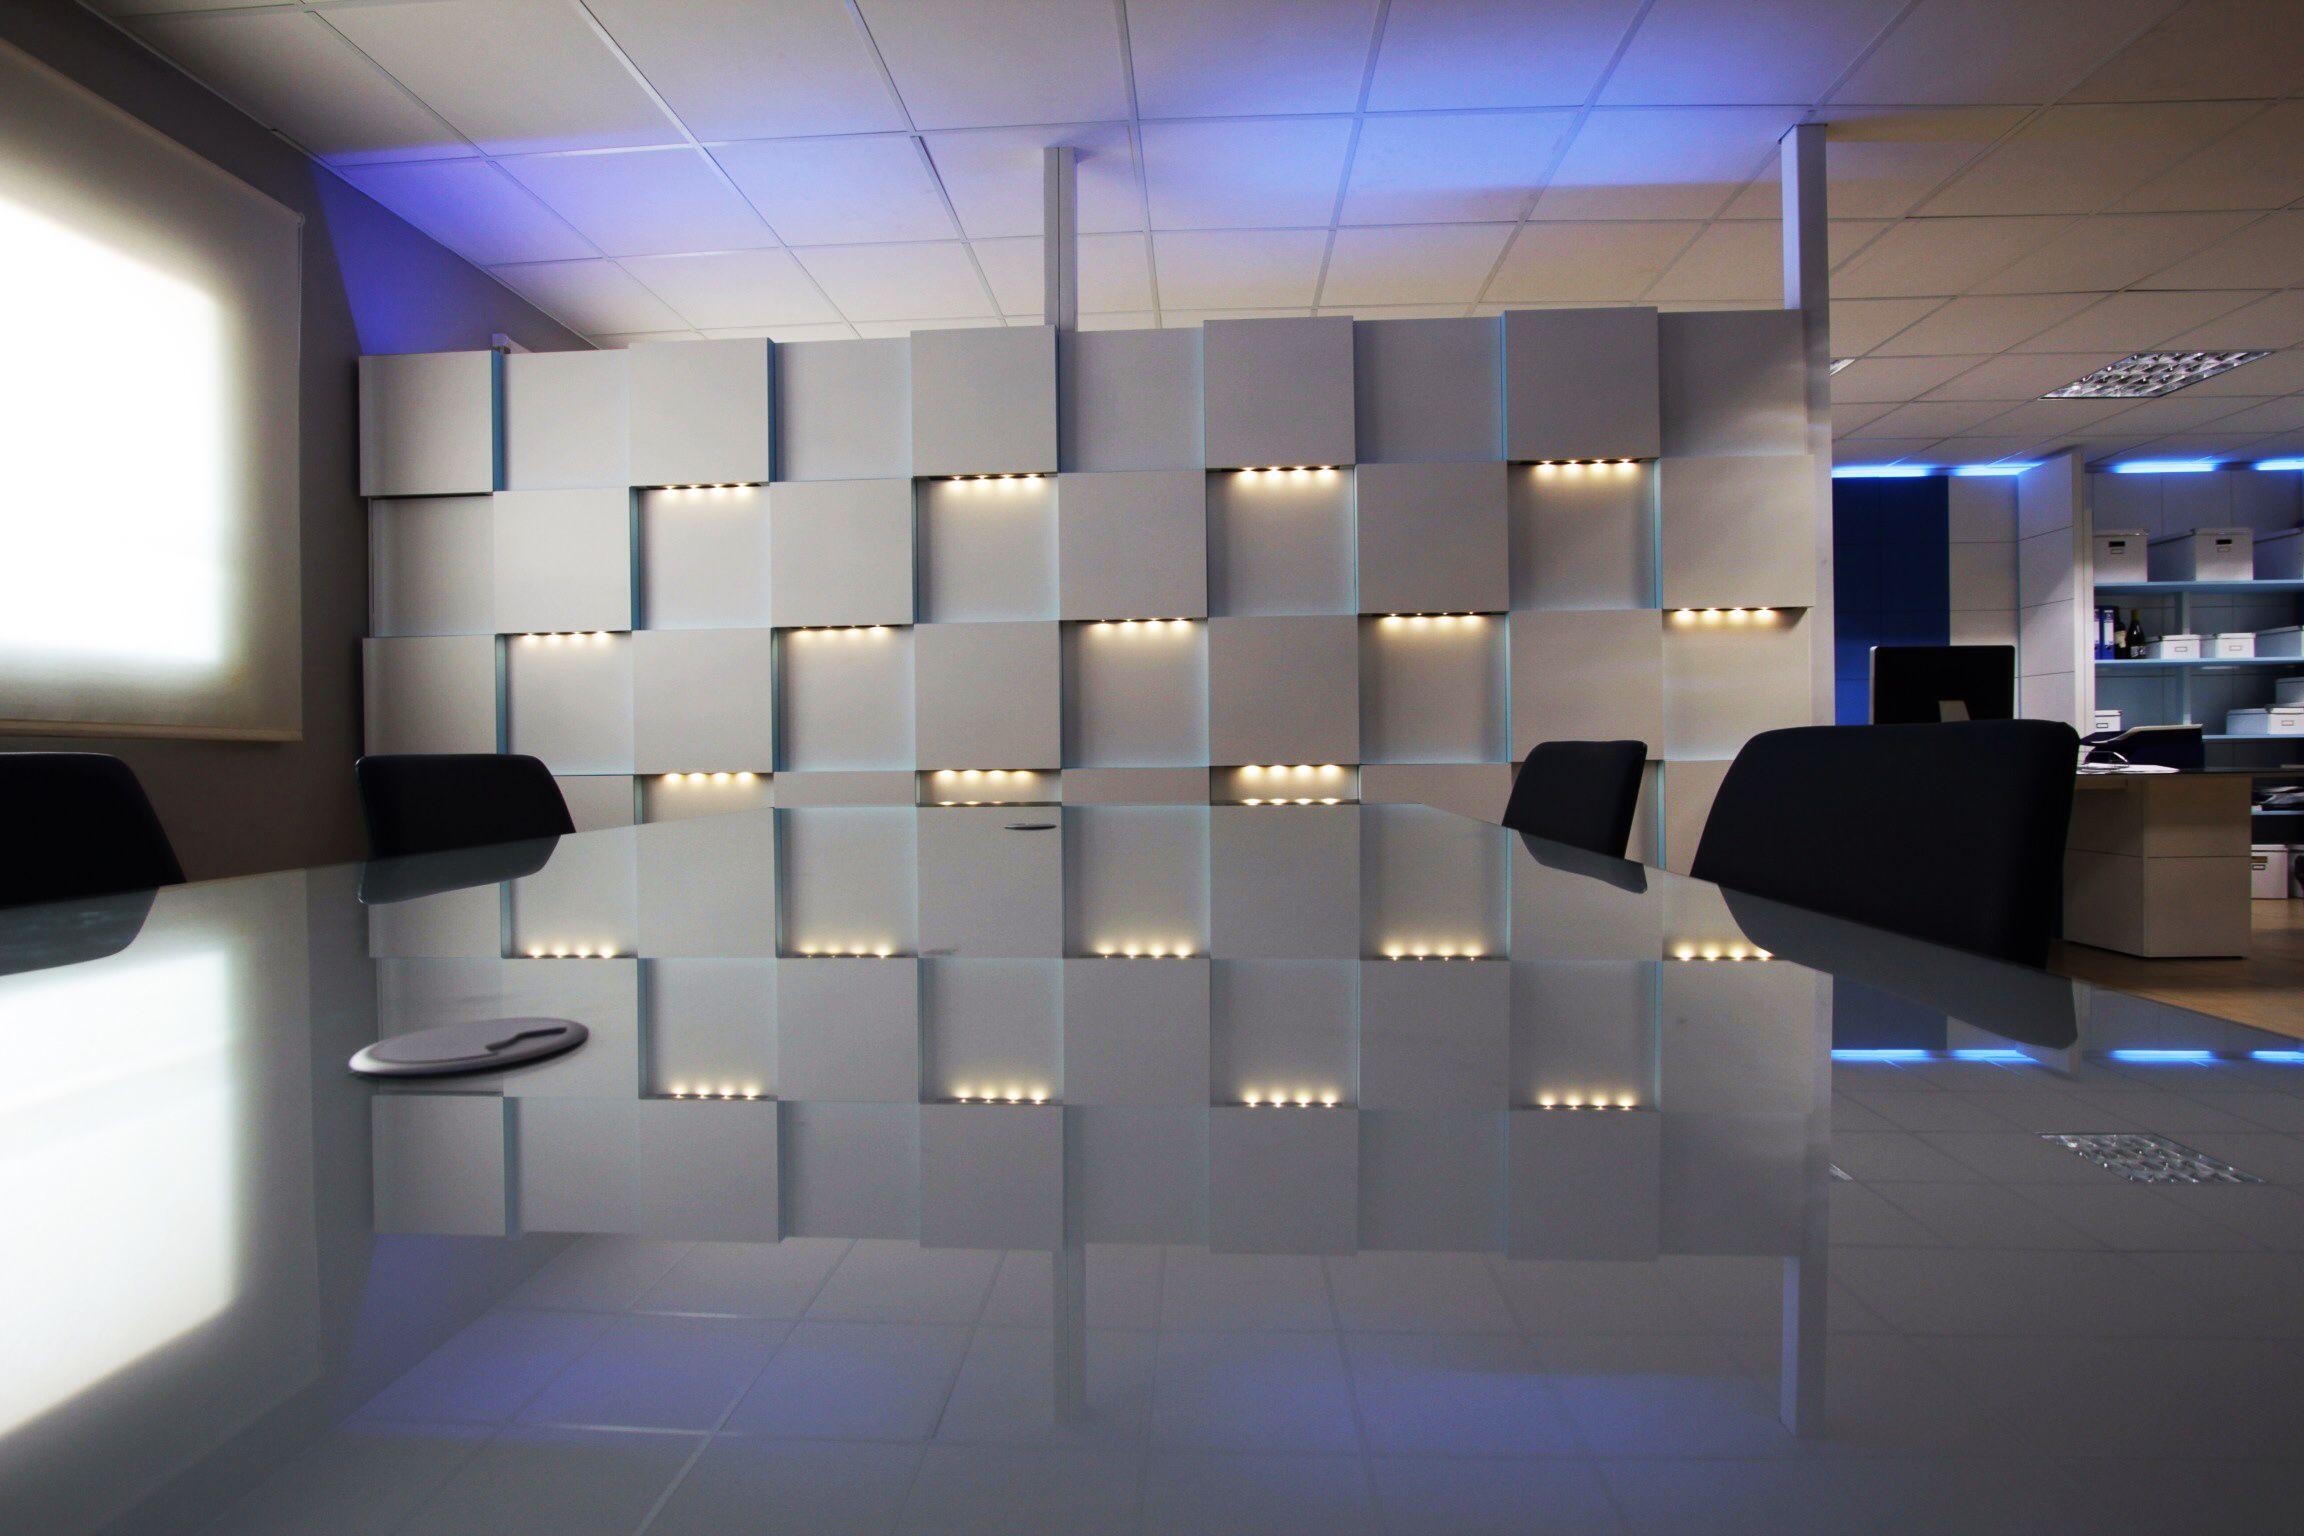 Tabique separador de ambientes de serastone para oficina for Empresas de decoracion de interiores